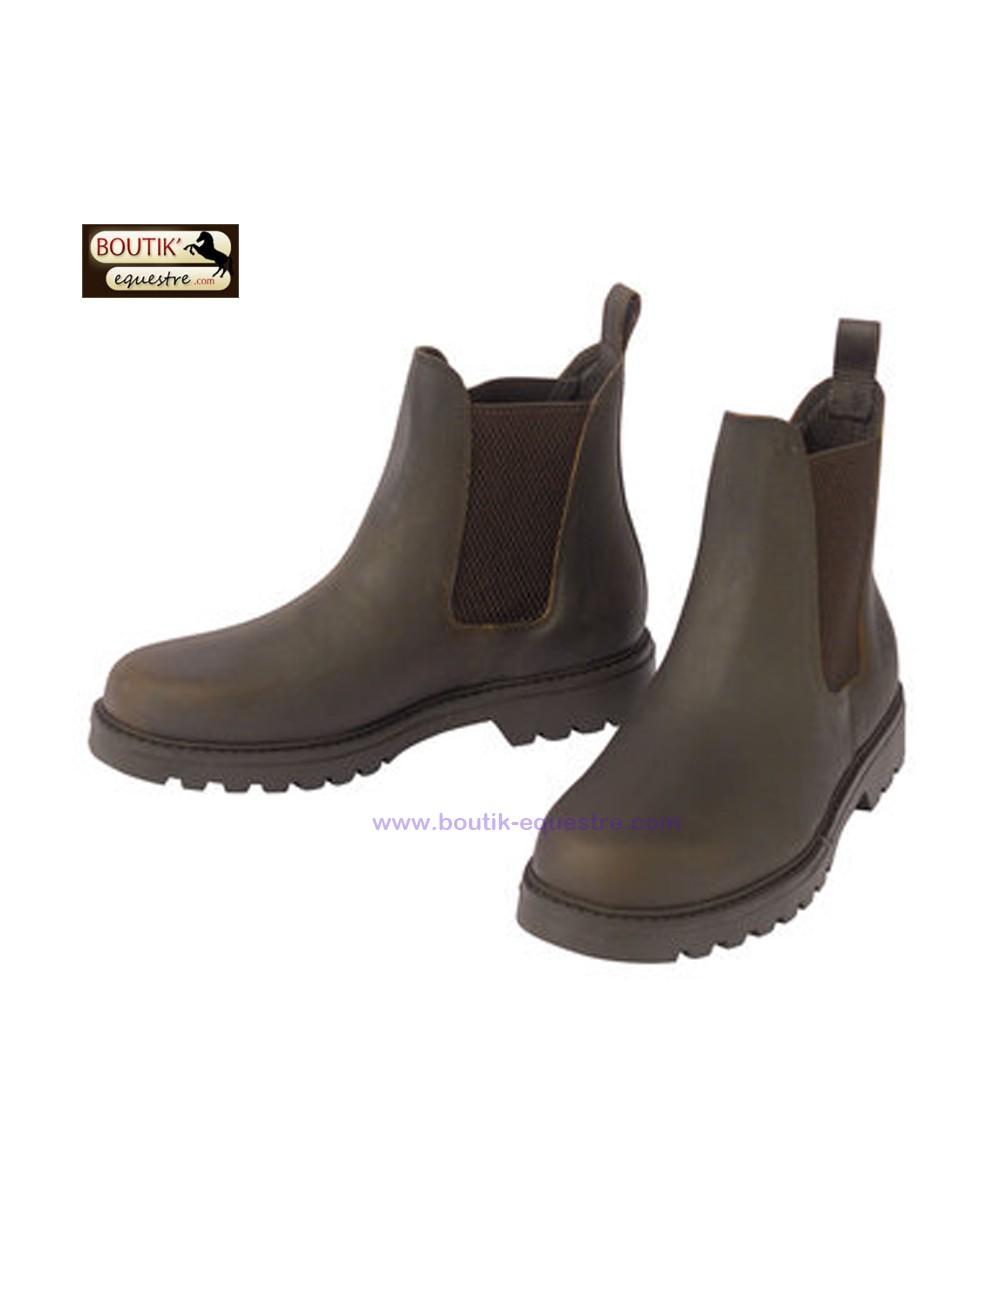 Boots Performance Brighton